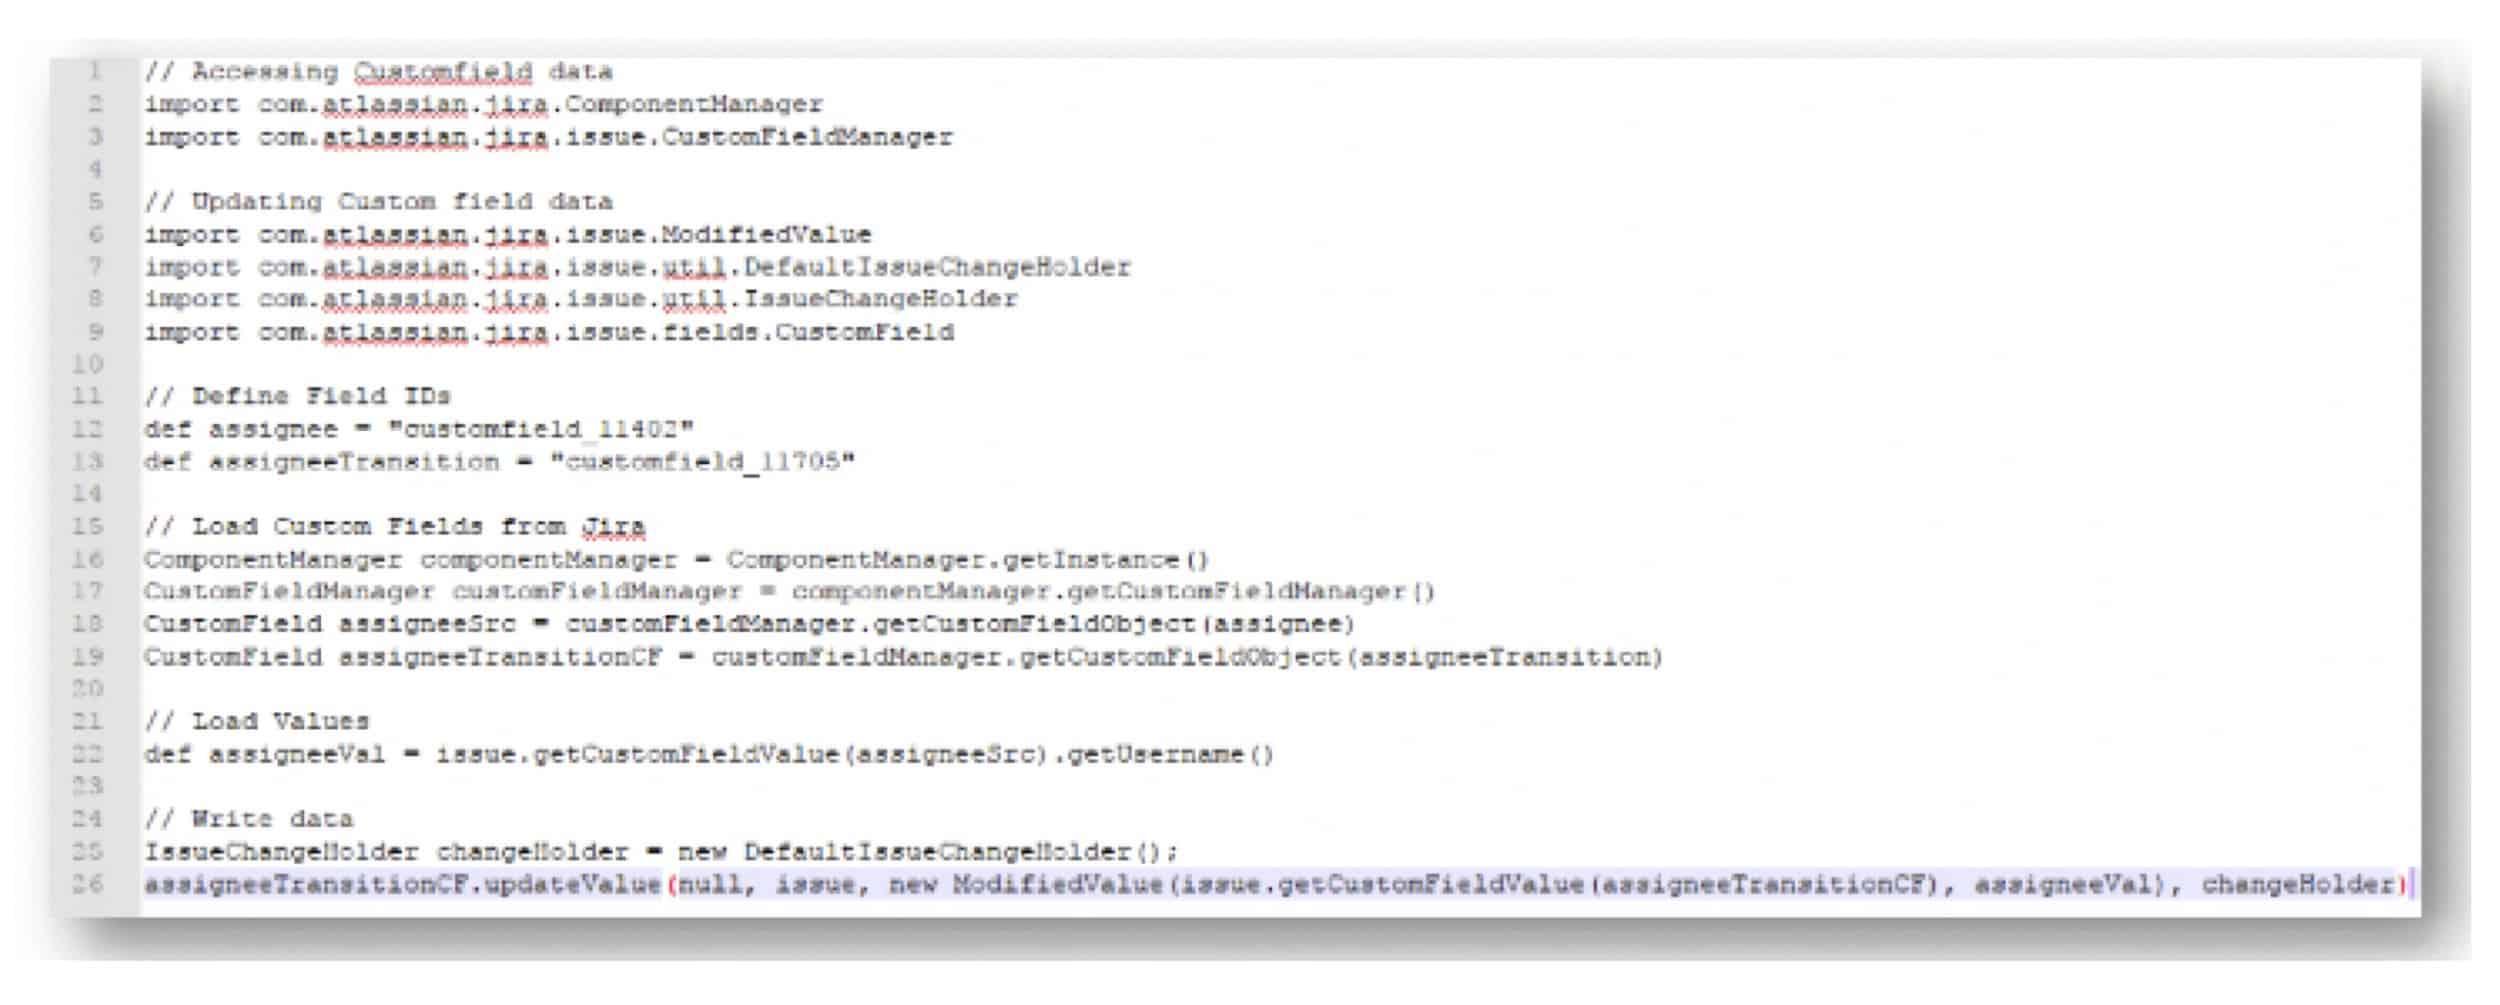 groovy code vs. power scripts